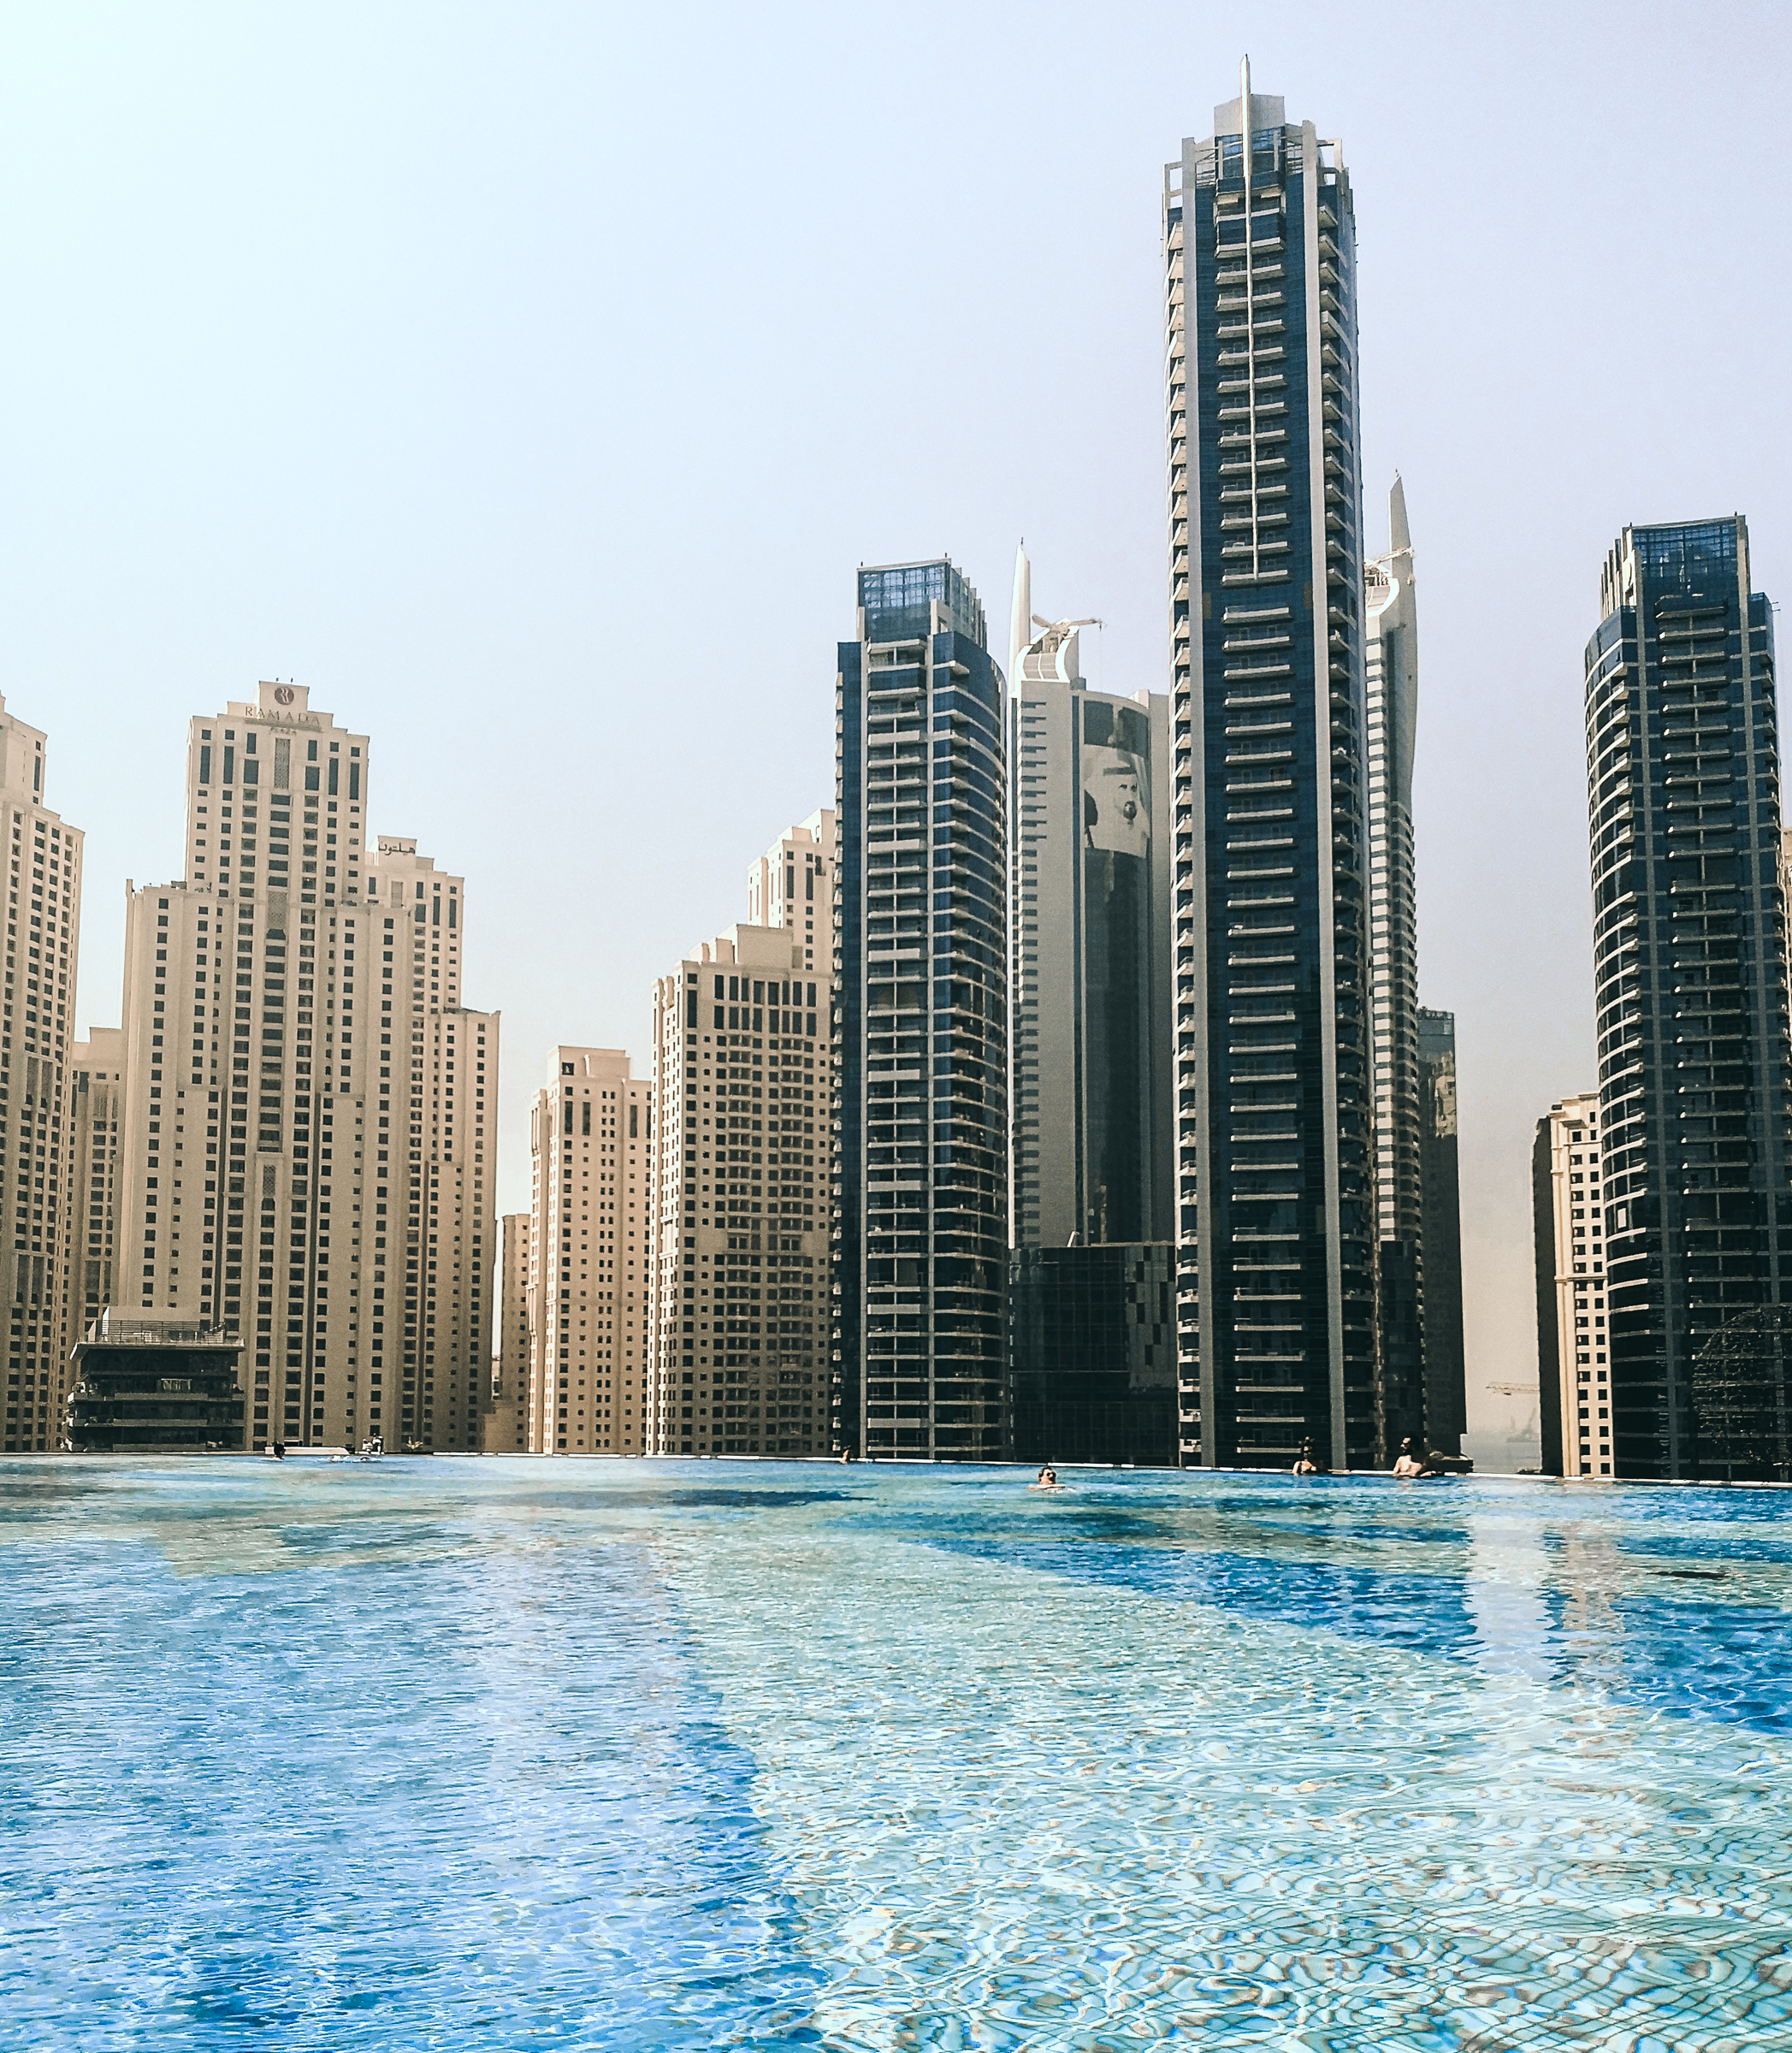 Tommeezjerry-Lifestyleblog-Fashionblog-Maennermodeblog-Maennerblog-Modeblog-Huawei-Mate-10-Pro-Travel-Photography-Dubai-Desert-City-Architecture